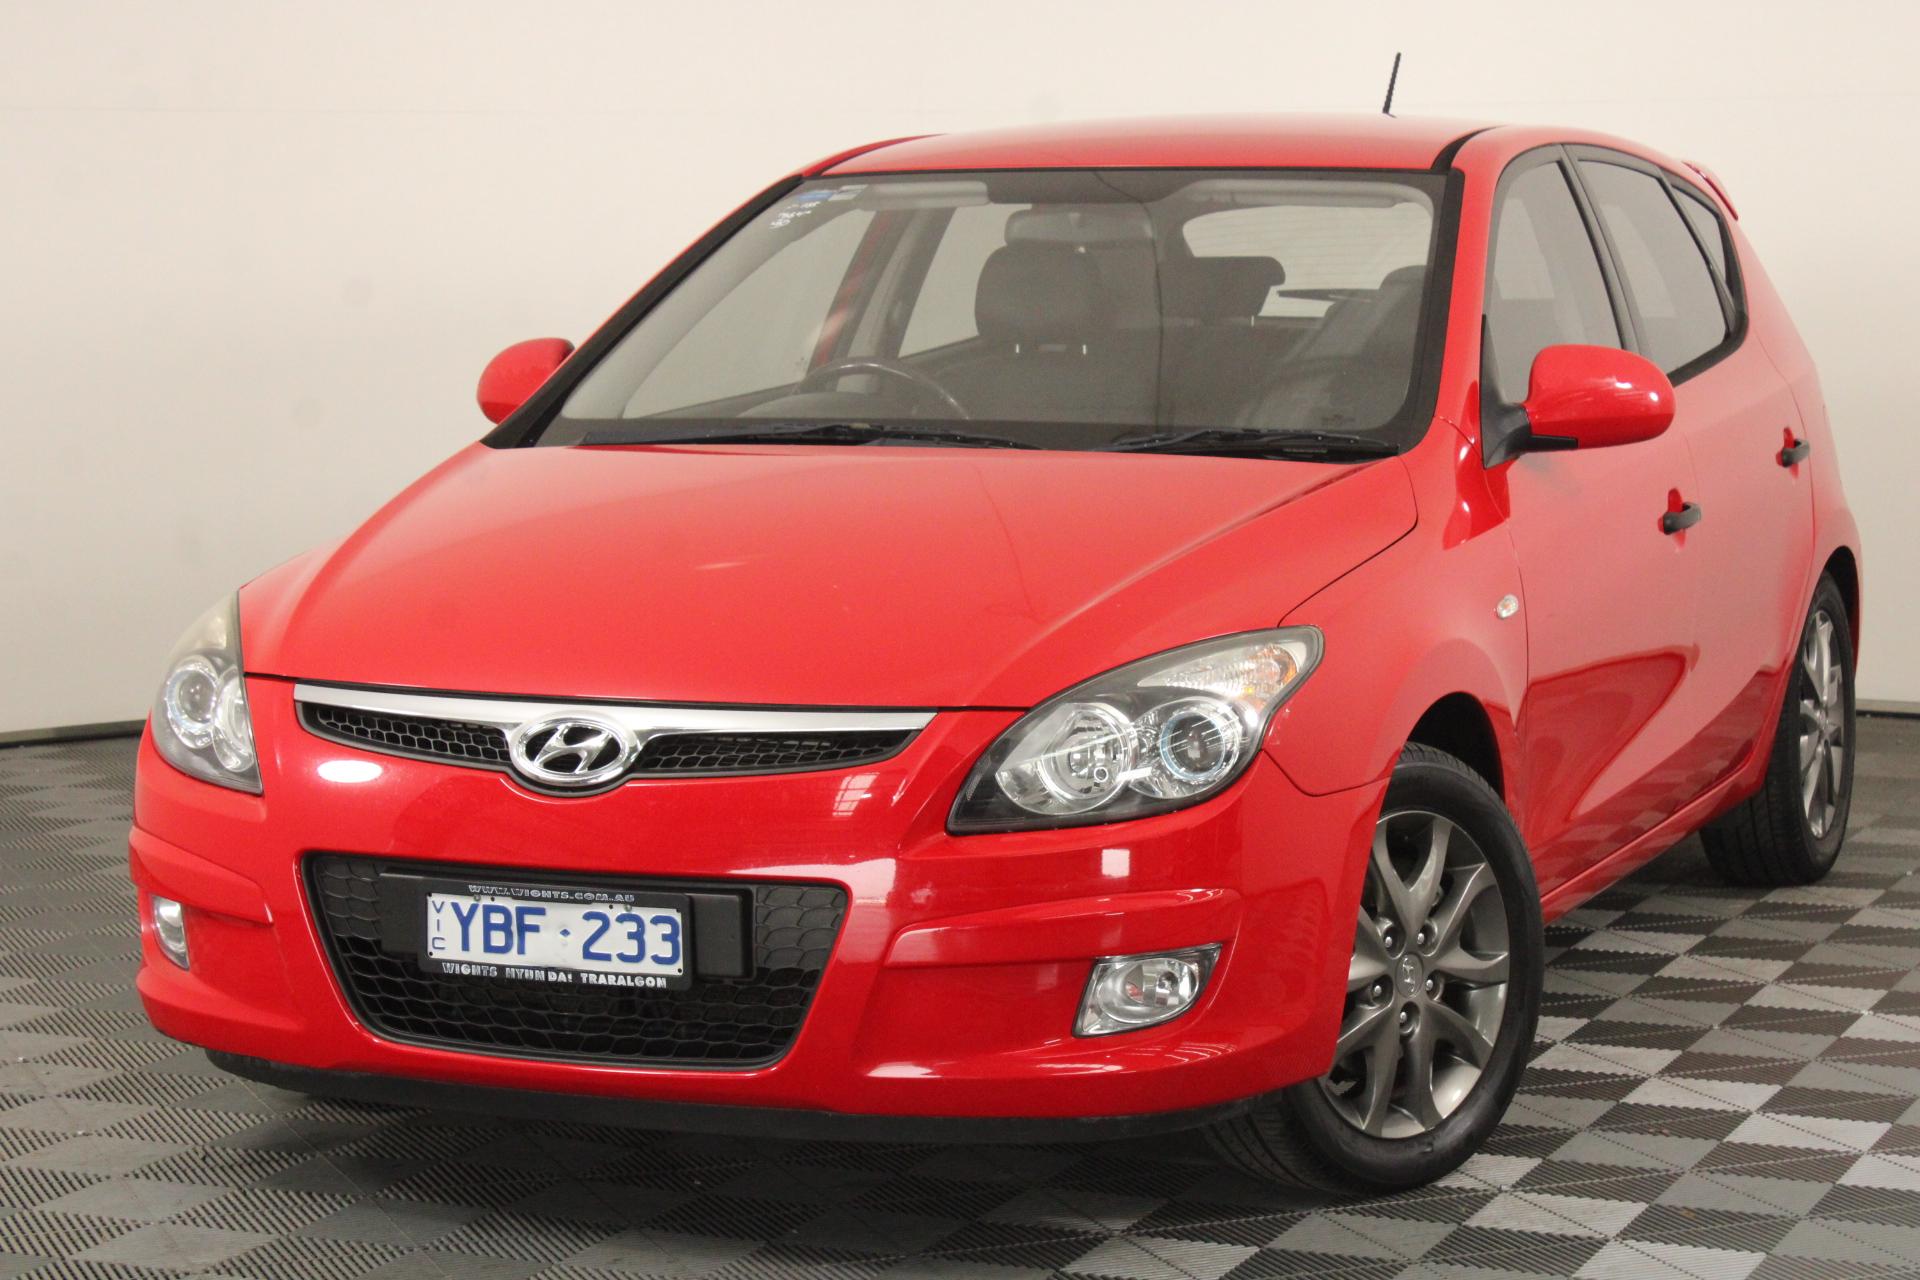 2011 Hyundai i30 SX FD Automatic Hatchback